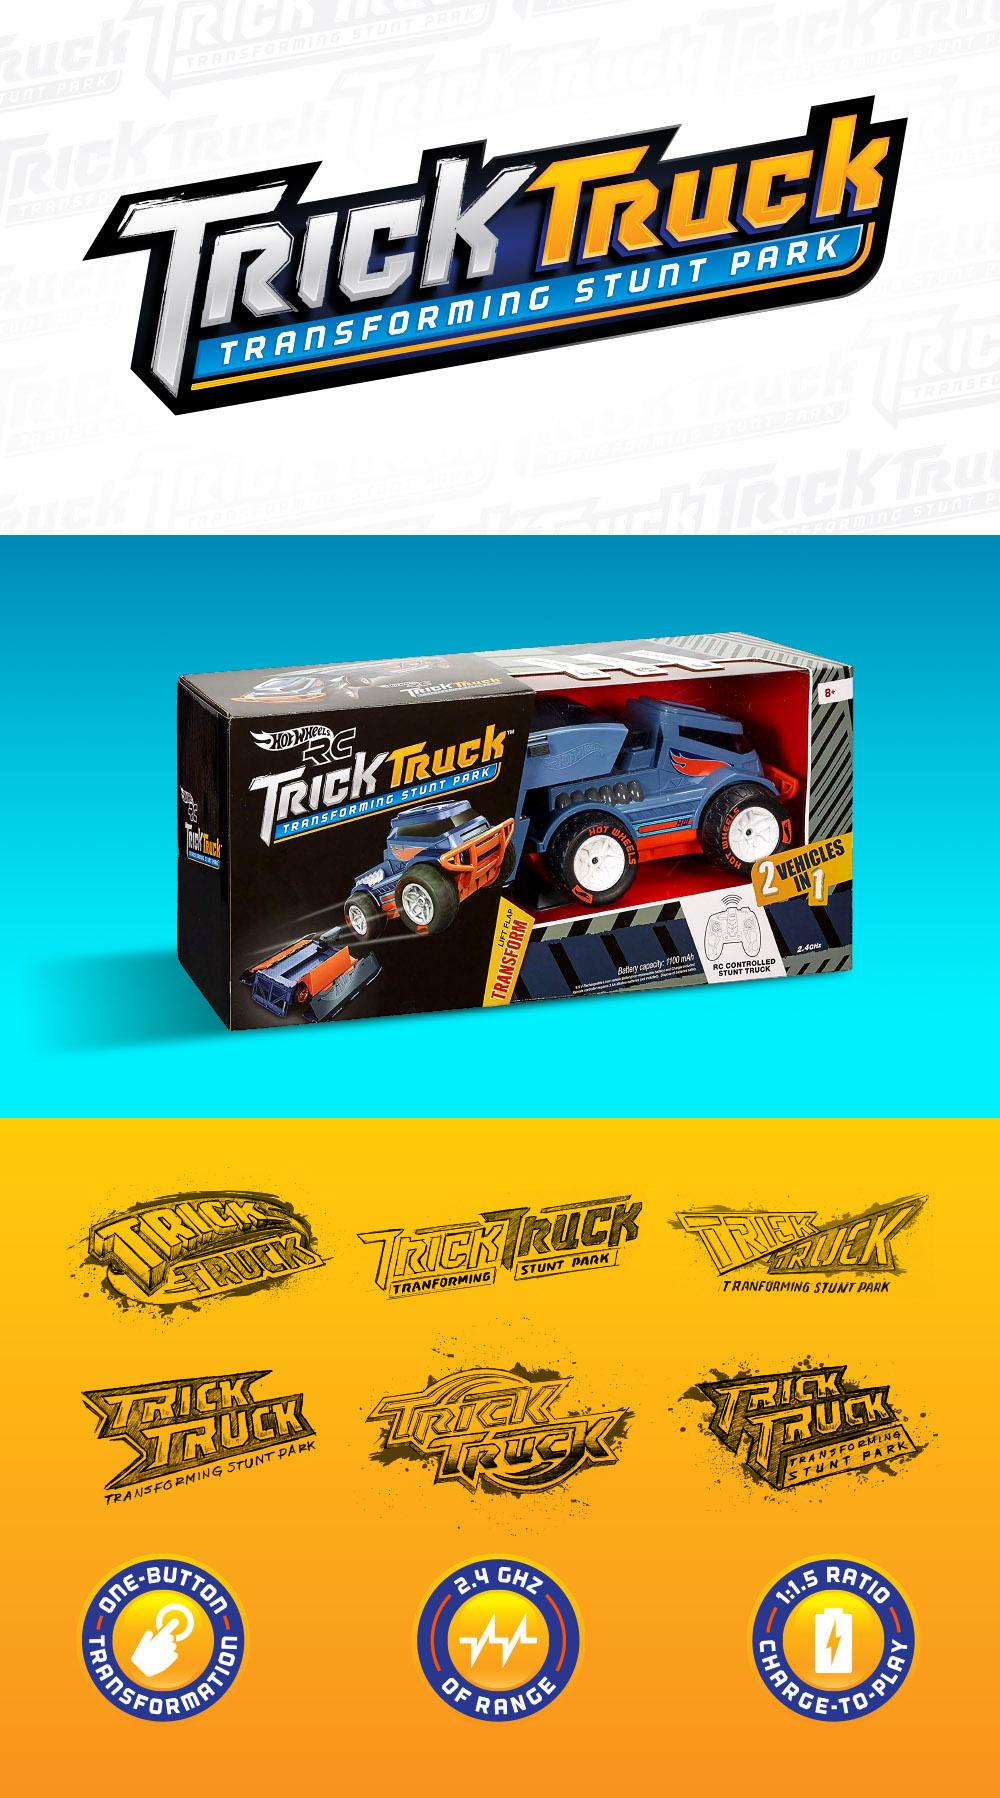 TrickTruck_01.jpg